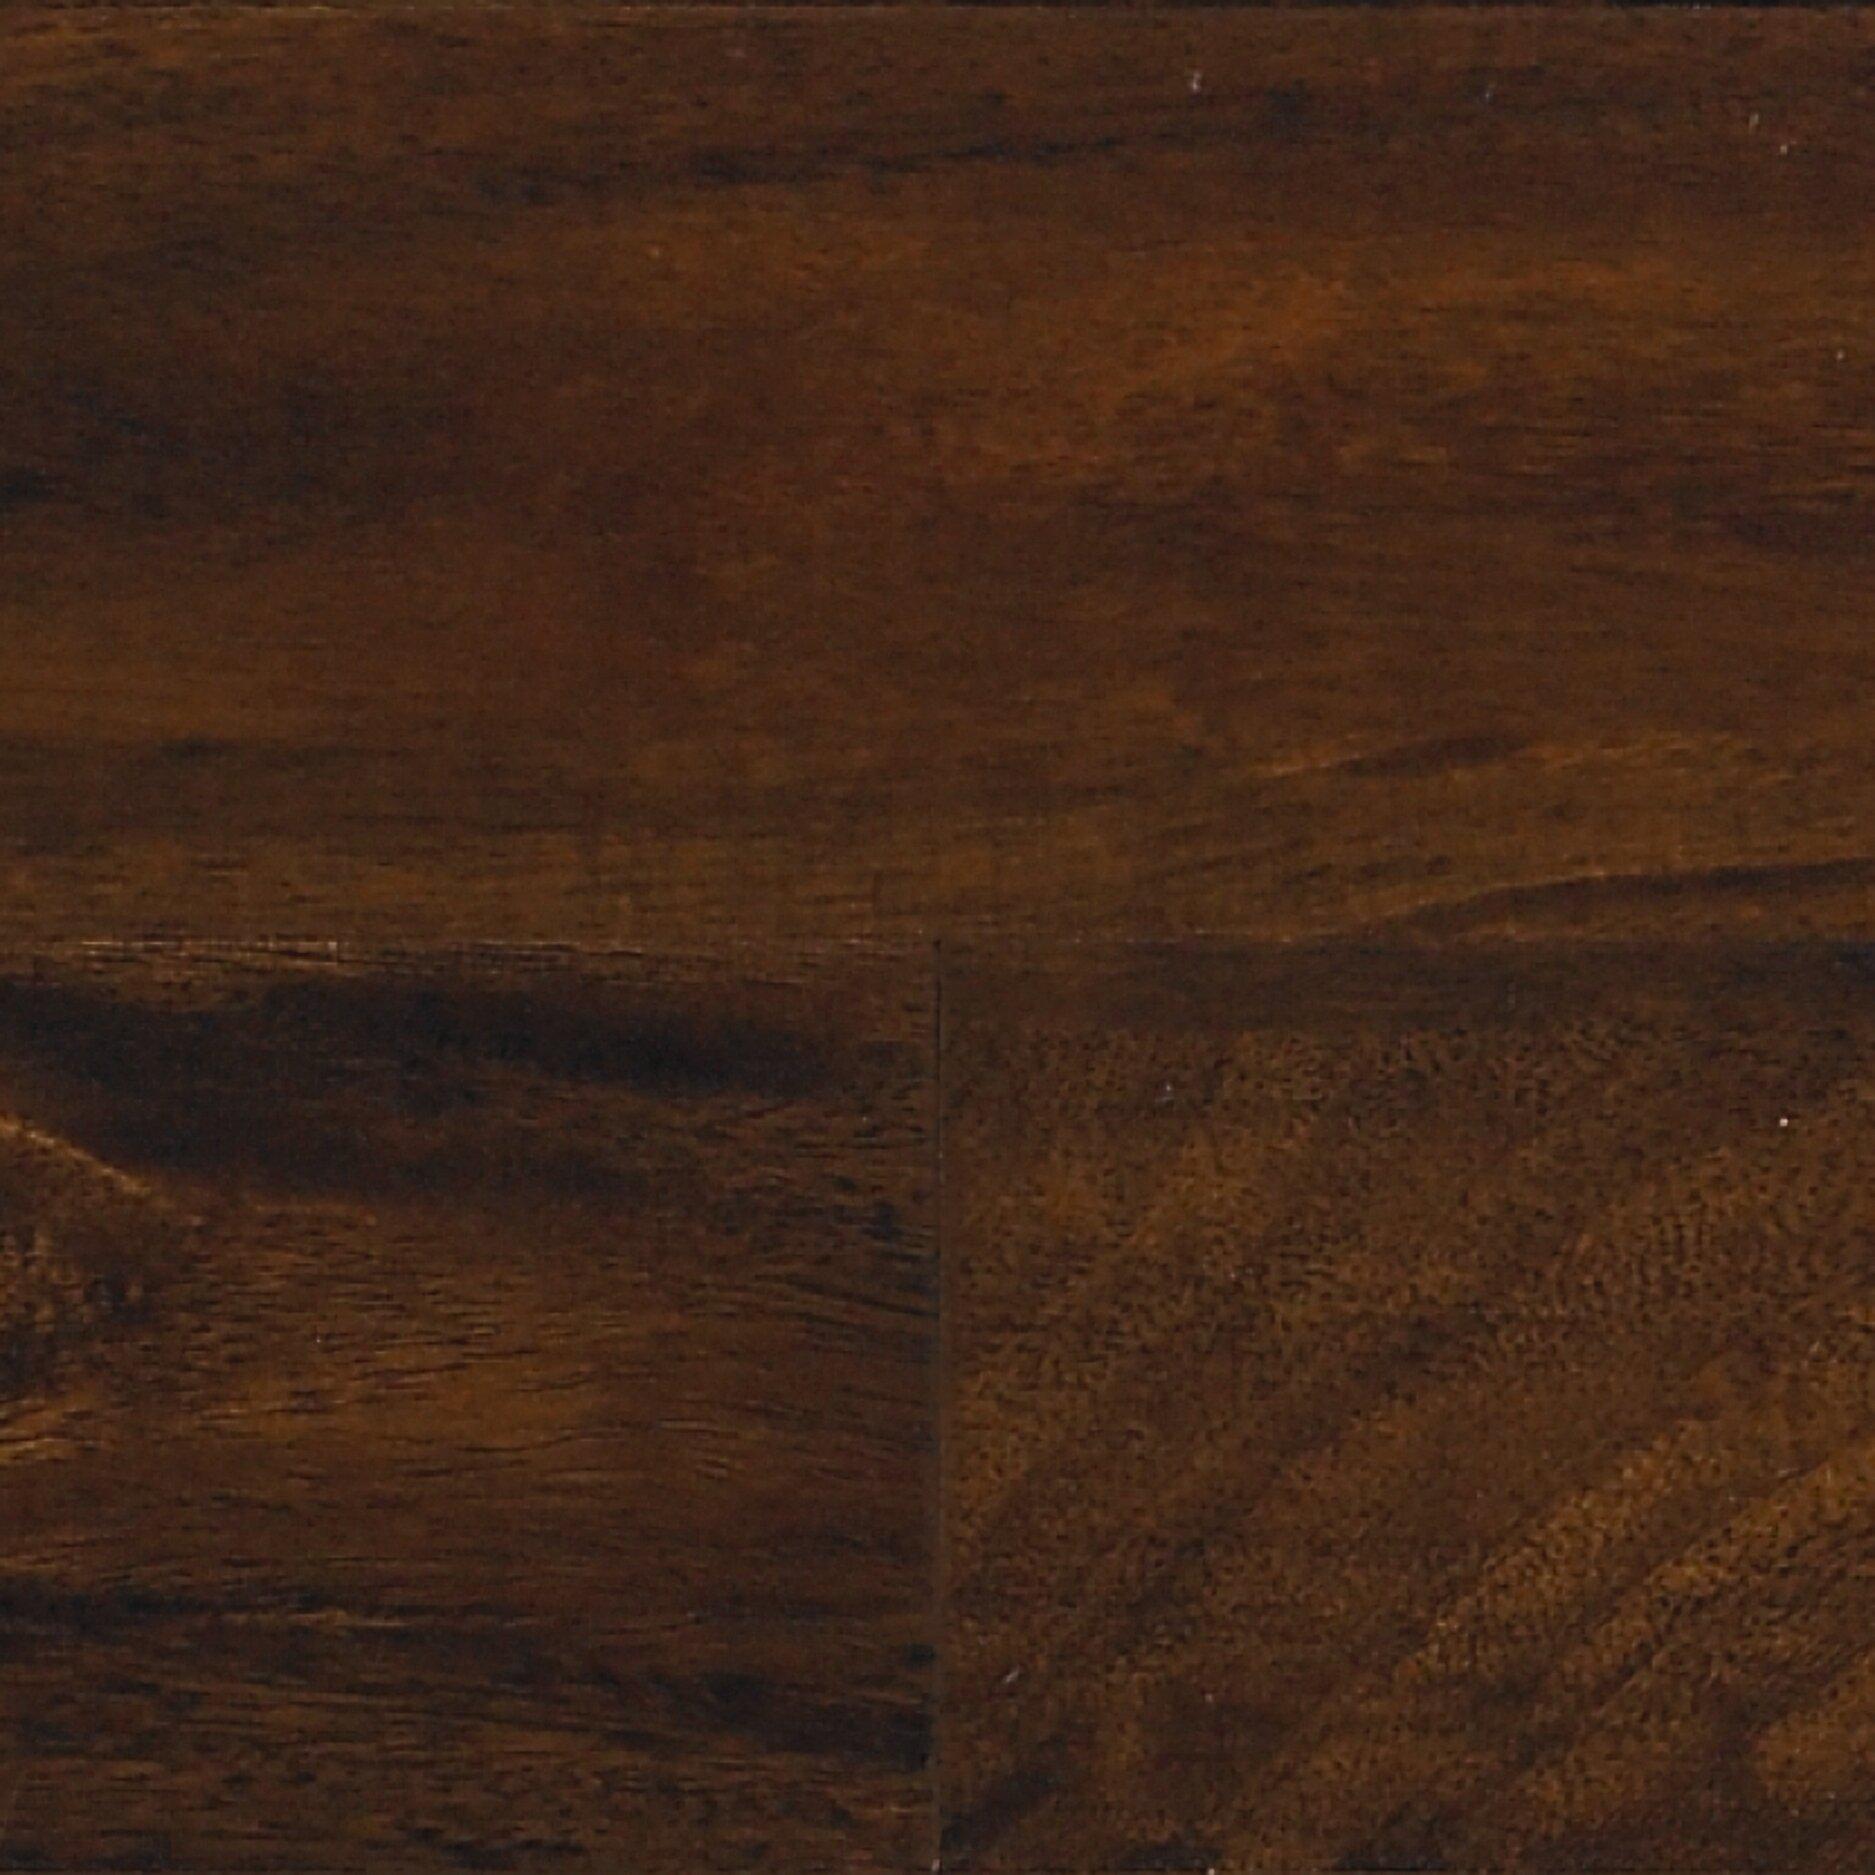 Mannington adura max 6 x 48 x 8mm acacia wpc luxury vinyl plank reviews wayfair